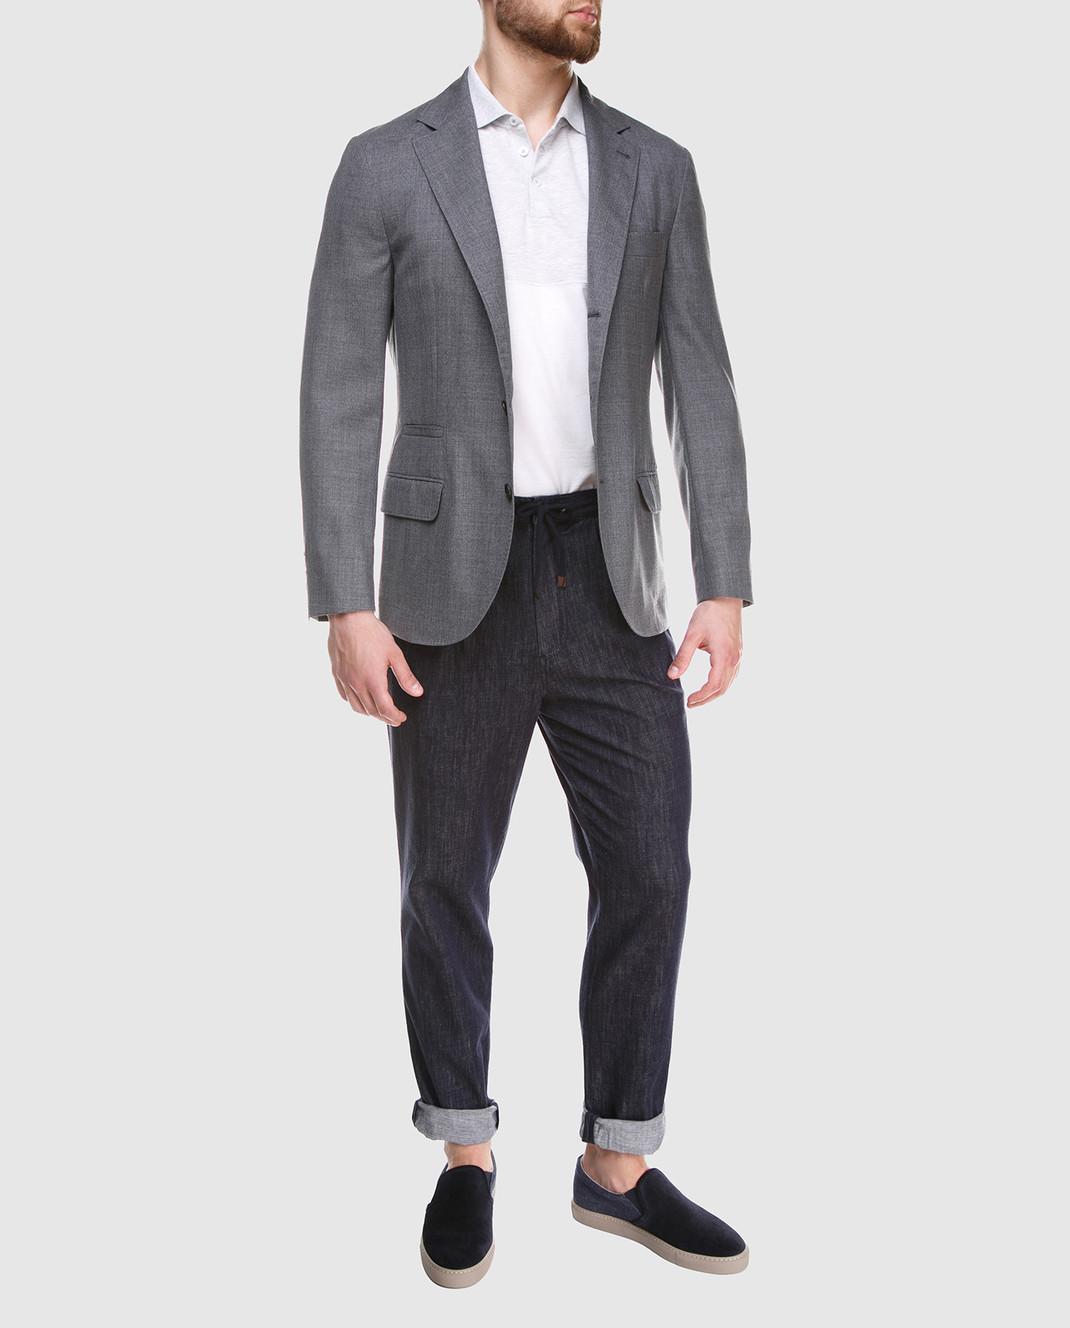 Brunello Cucinelli Серый пиджак из шерсти MF4237BTD изображение 2